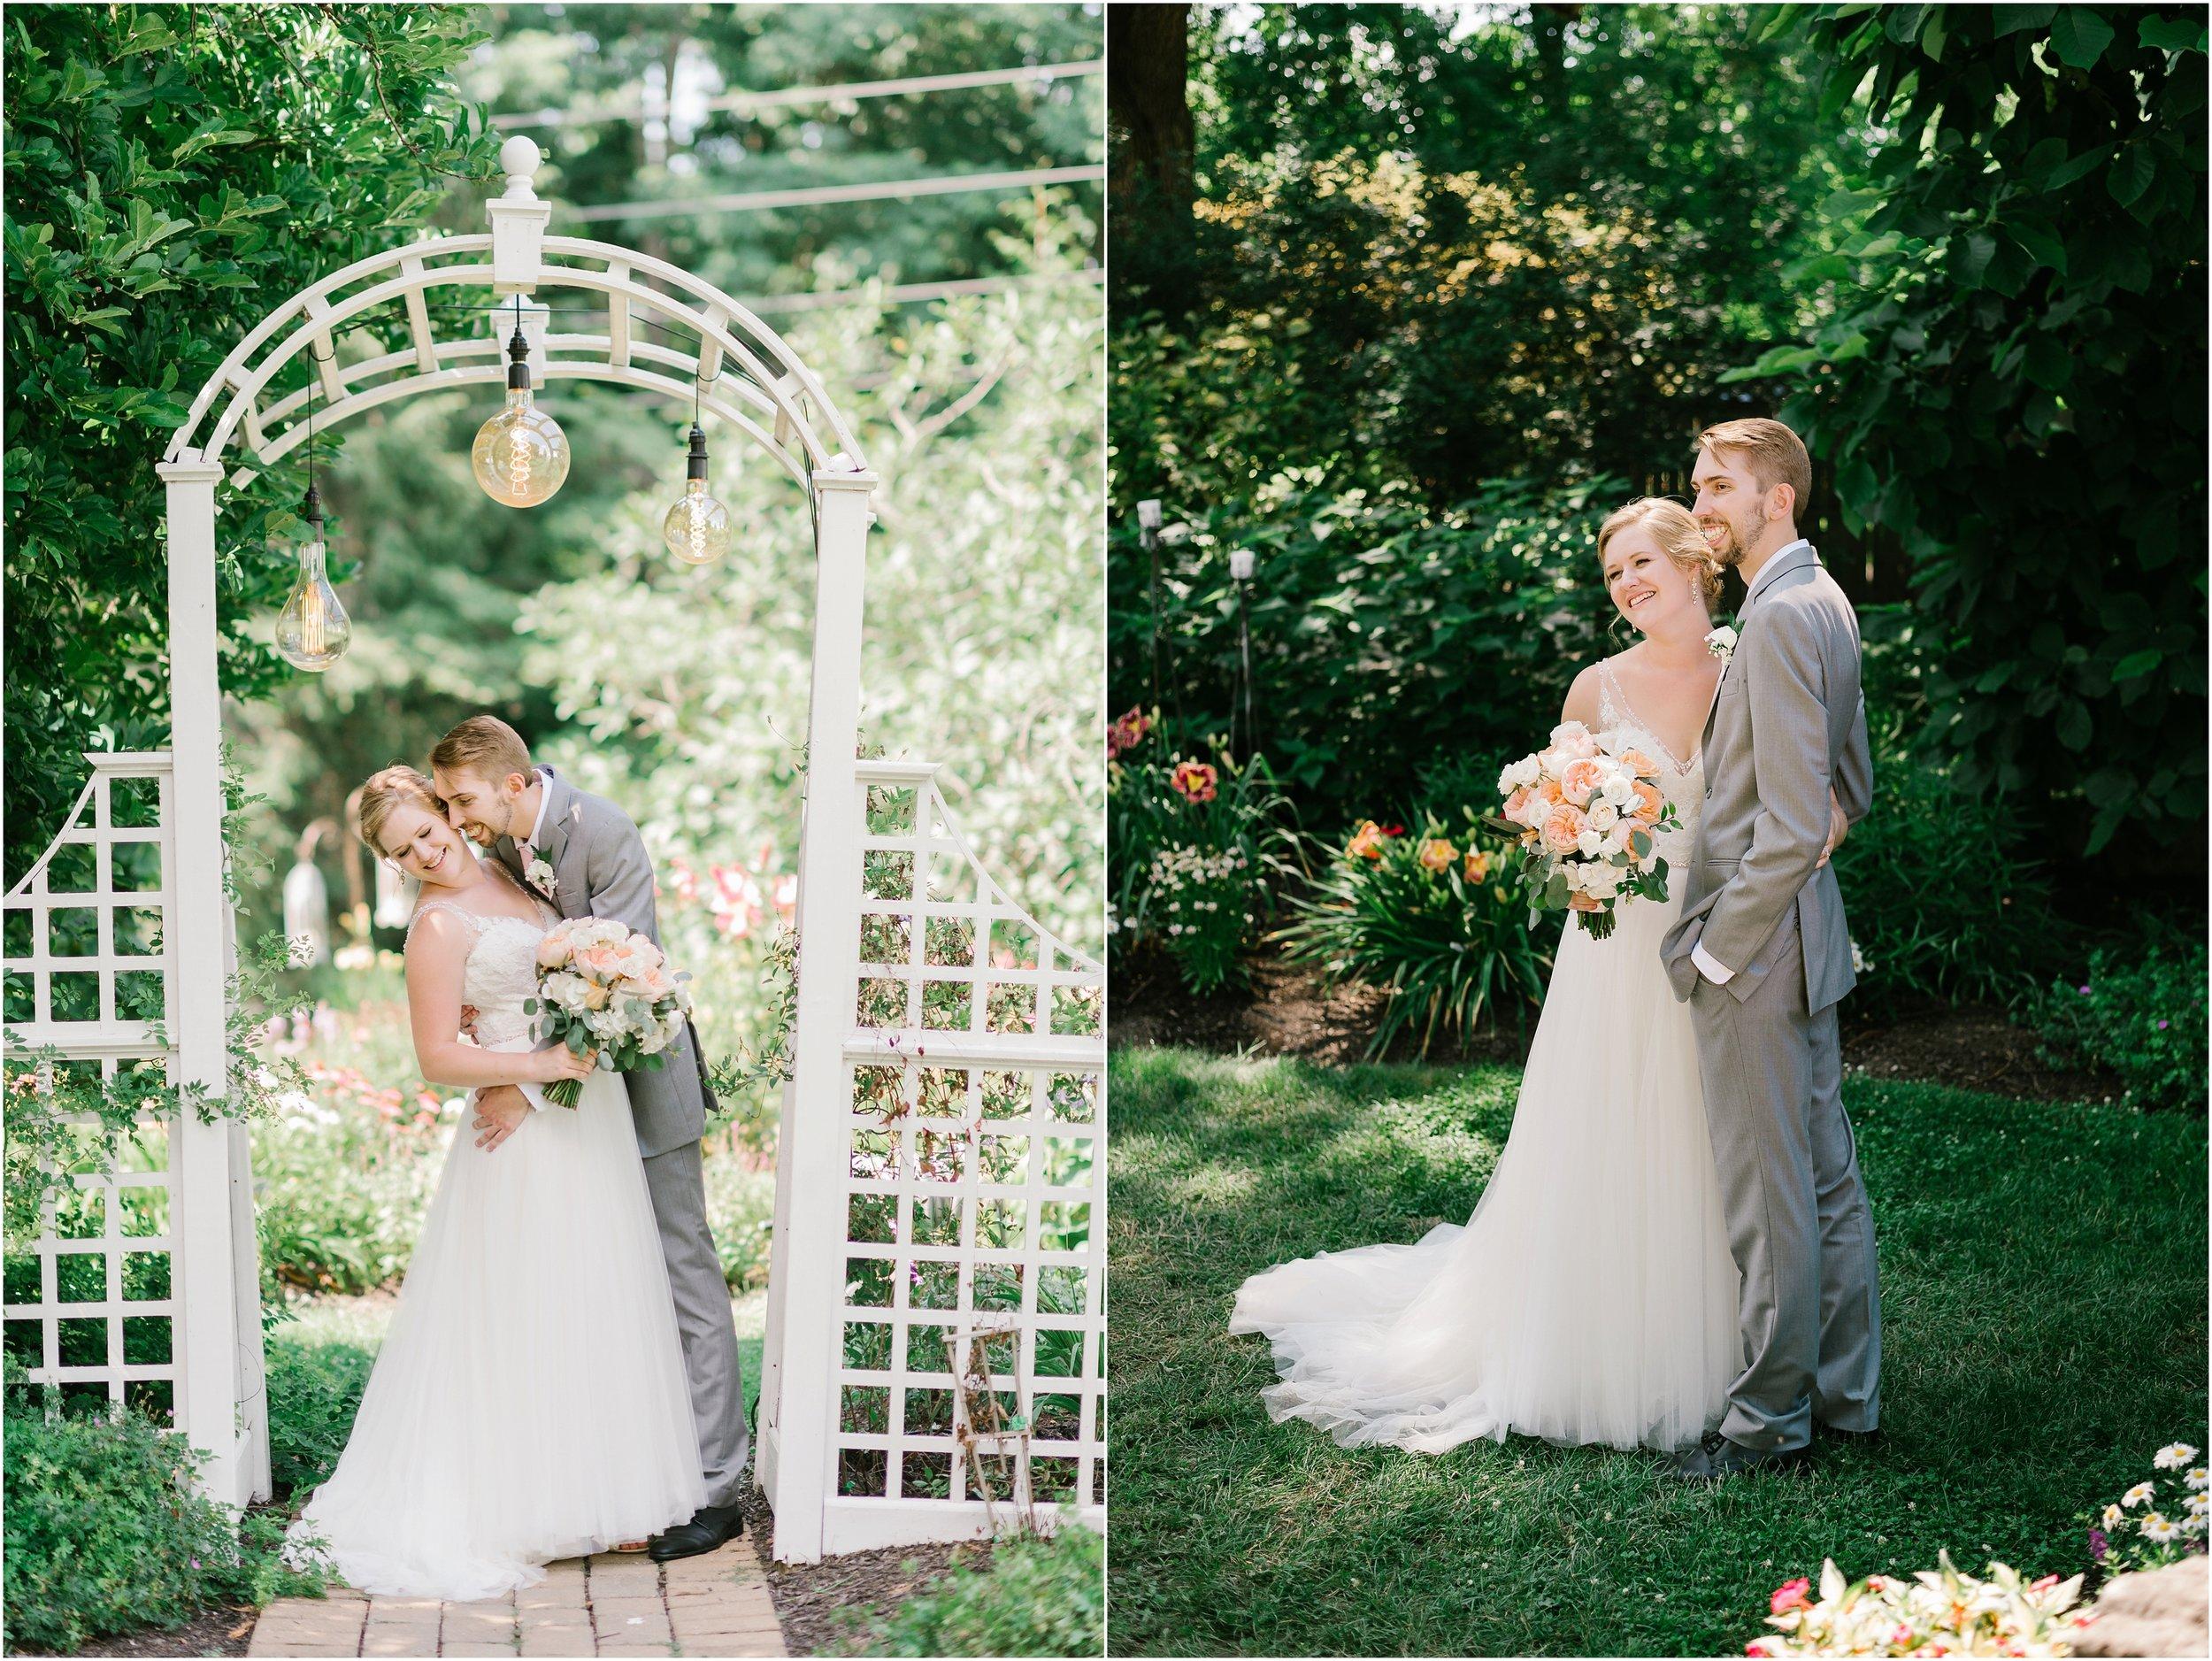 Rebecca_Shehorn_Photography_Indianapolis_Wedding_Photographer_8496.jpg